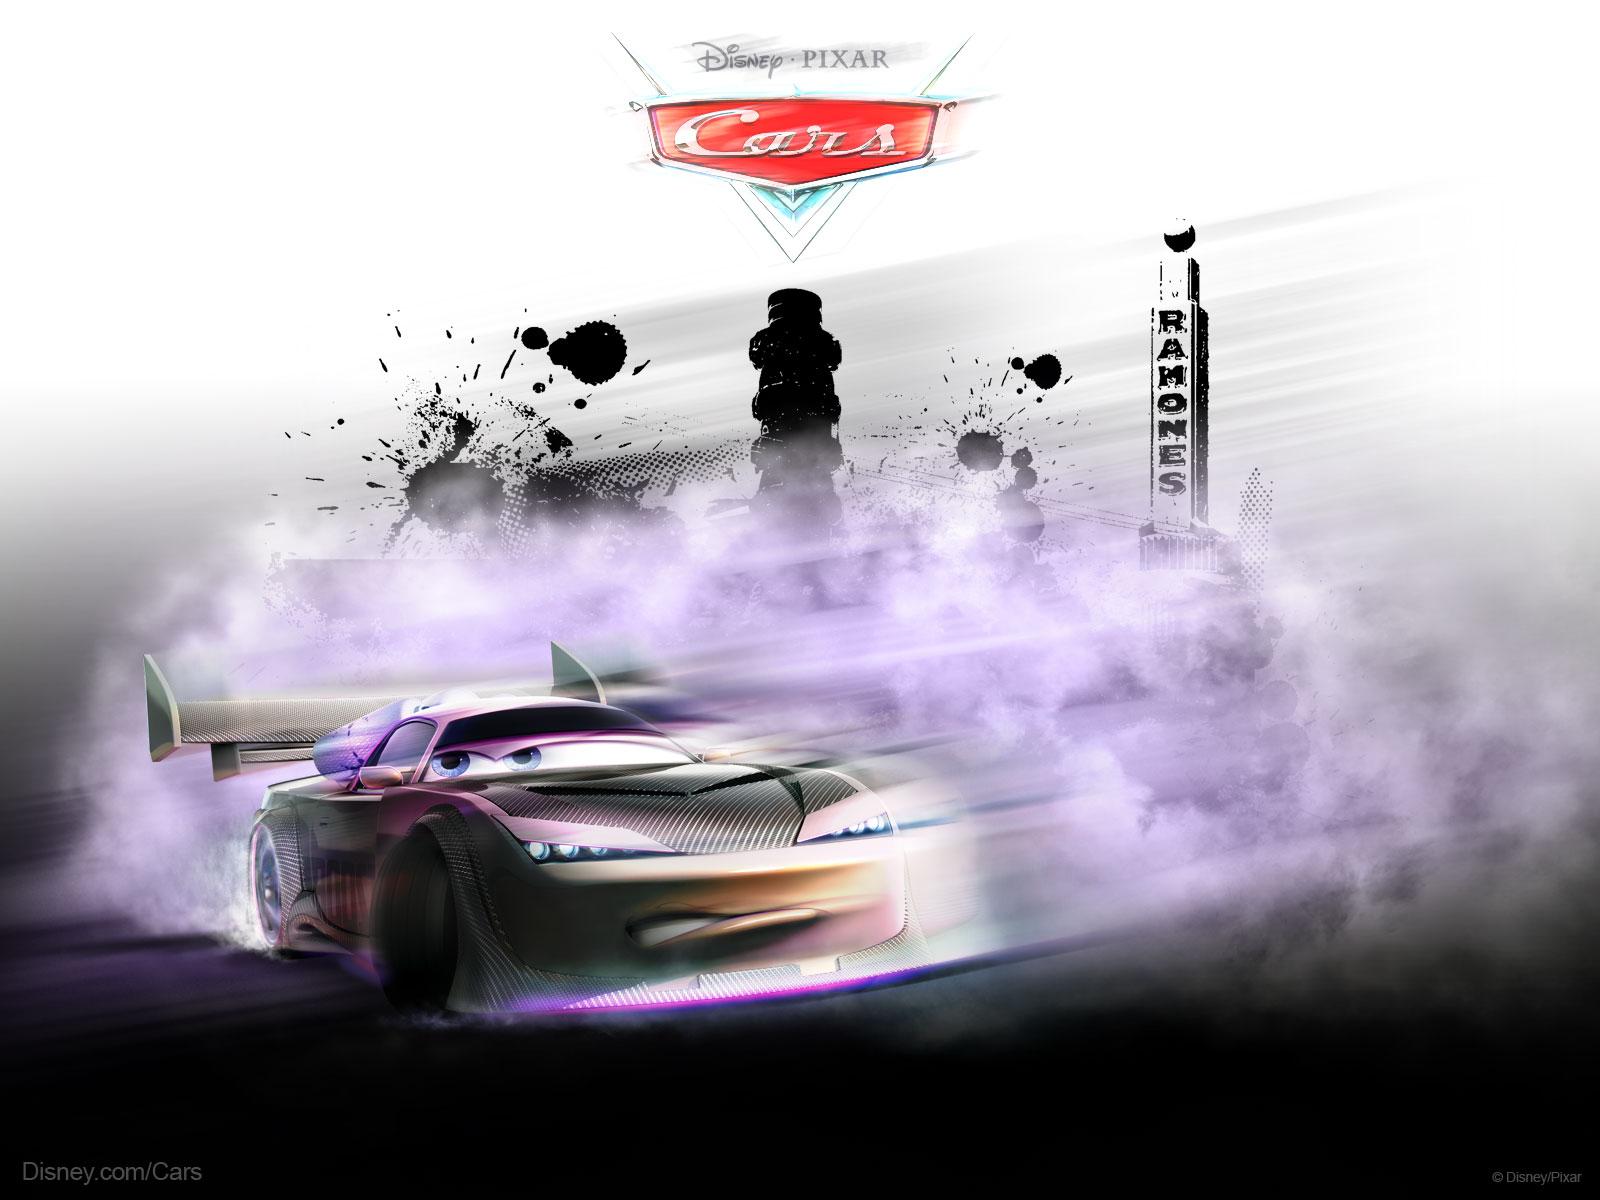 Wallpaper boost wallpaper - Disney cars 3 wallpaper ...